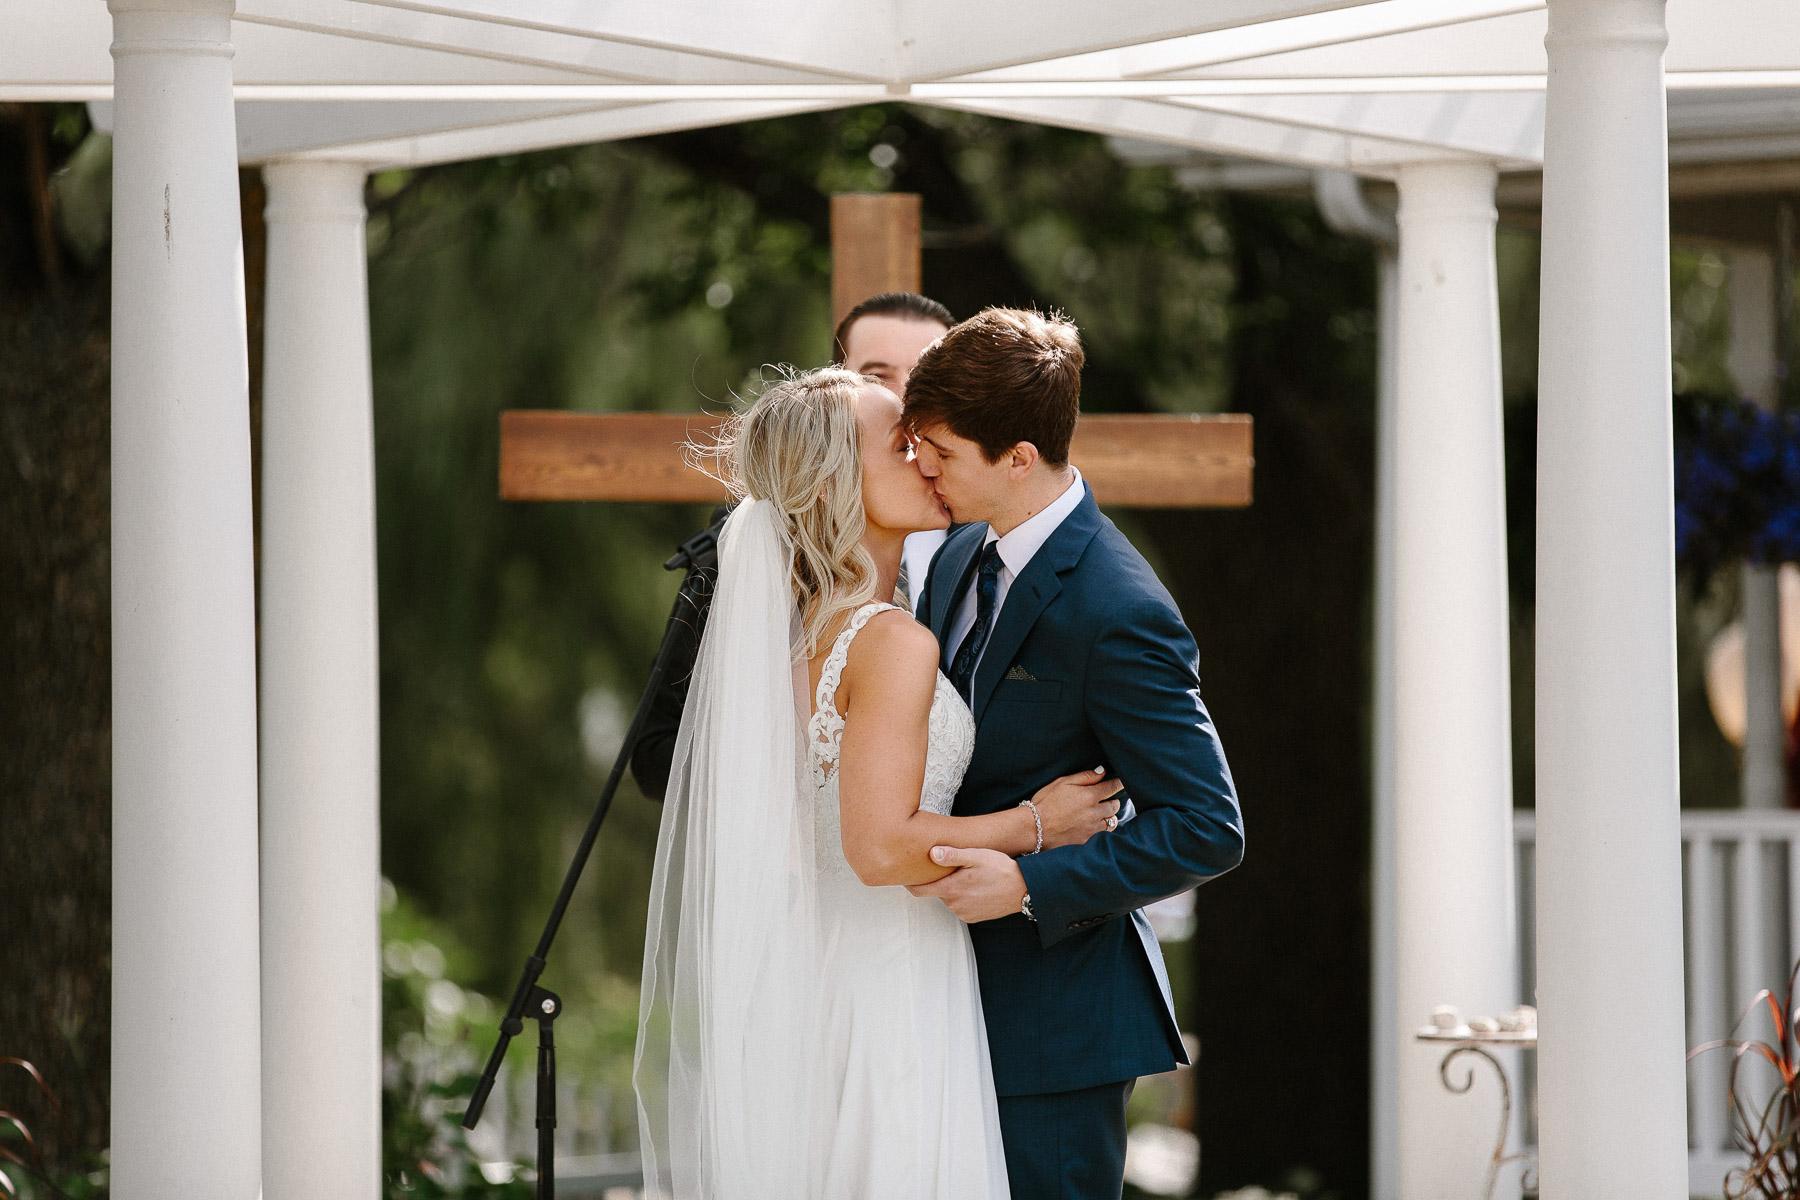 Intimate_Farmhouse_SD_Wedding_Bridgette_Philip_042.jpg